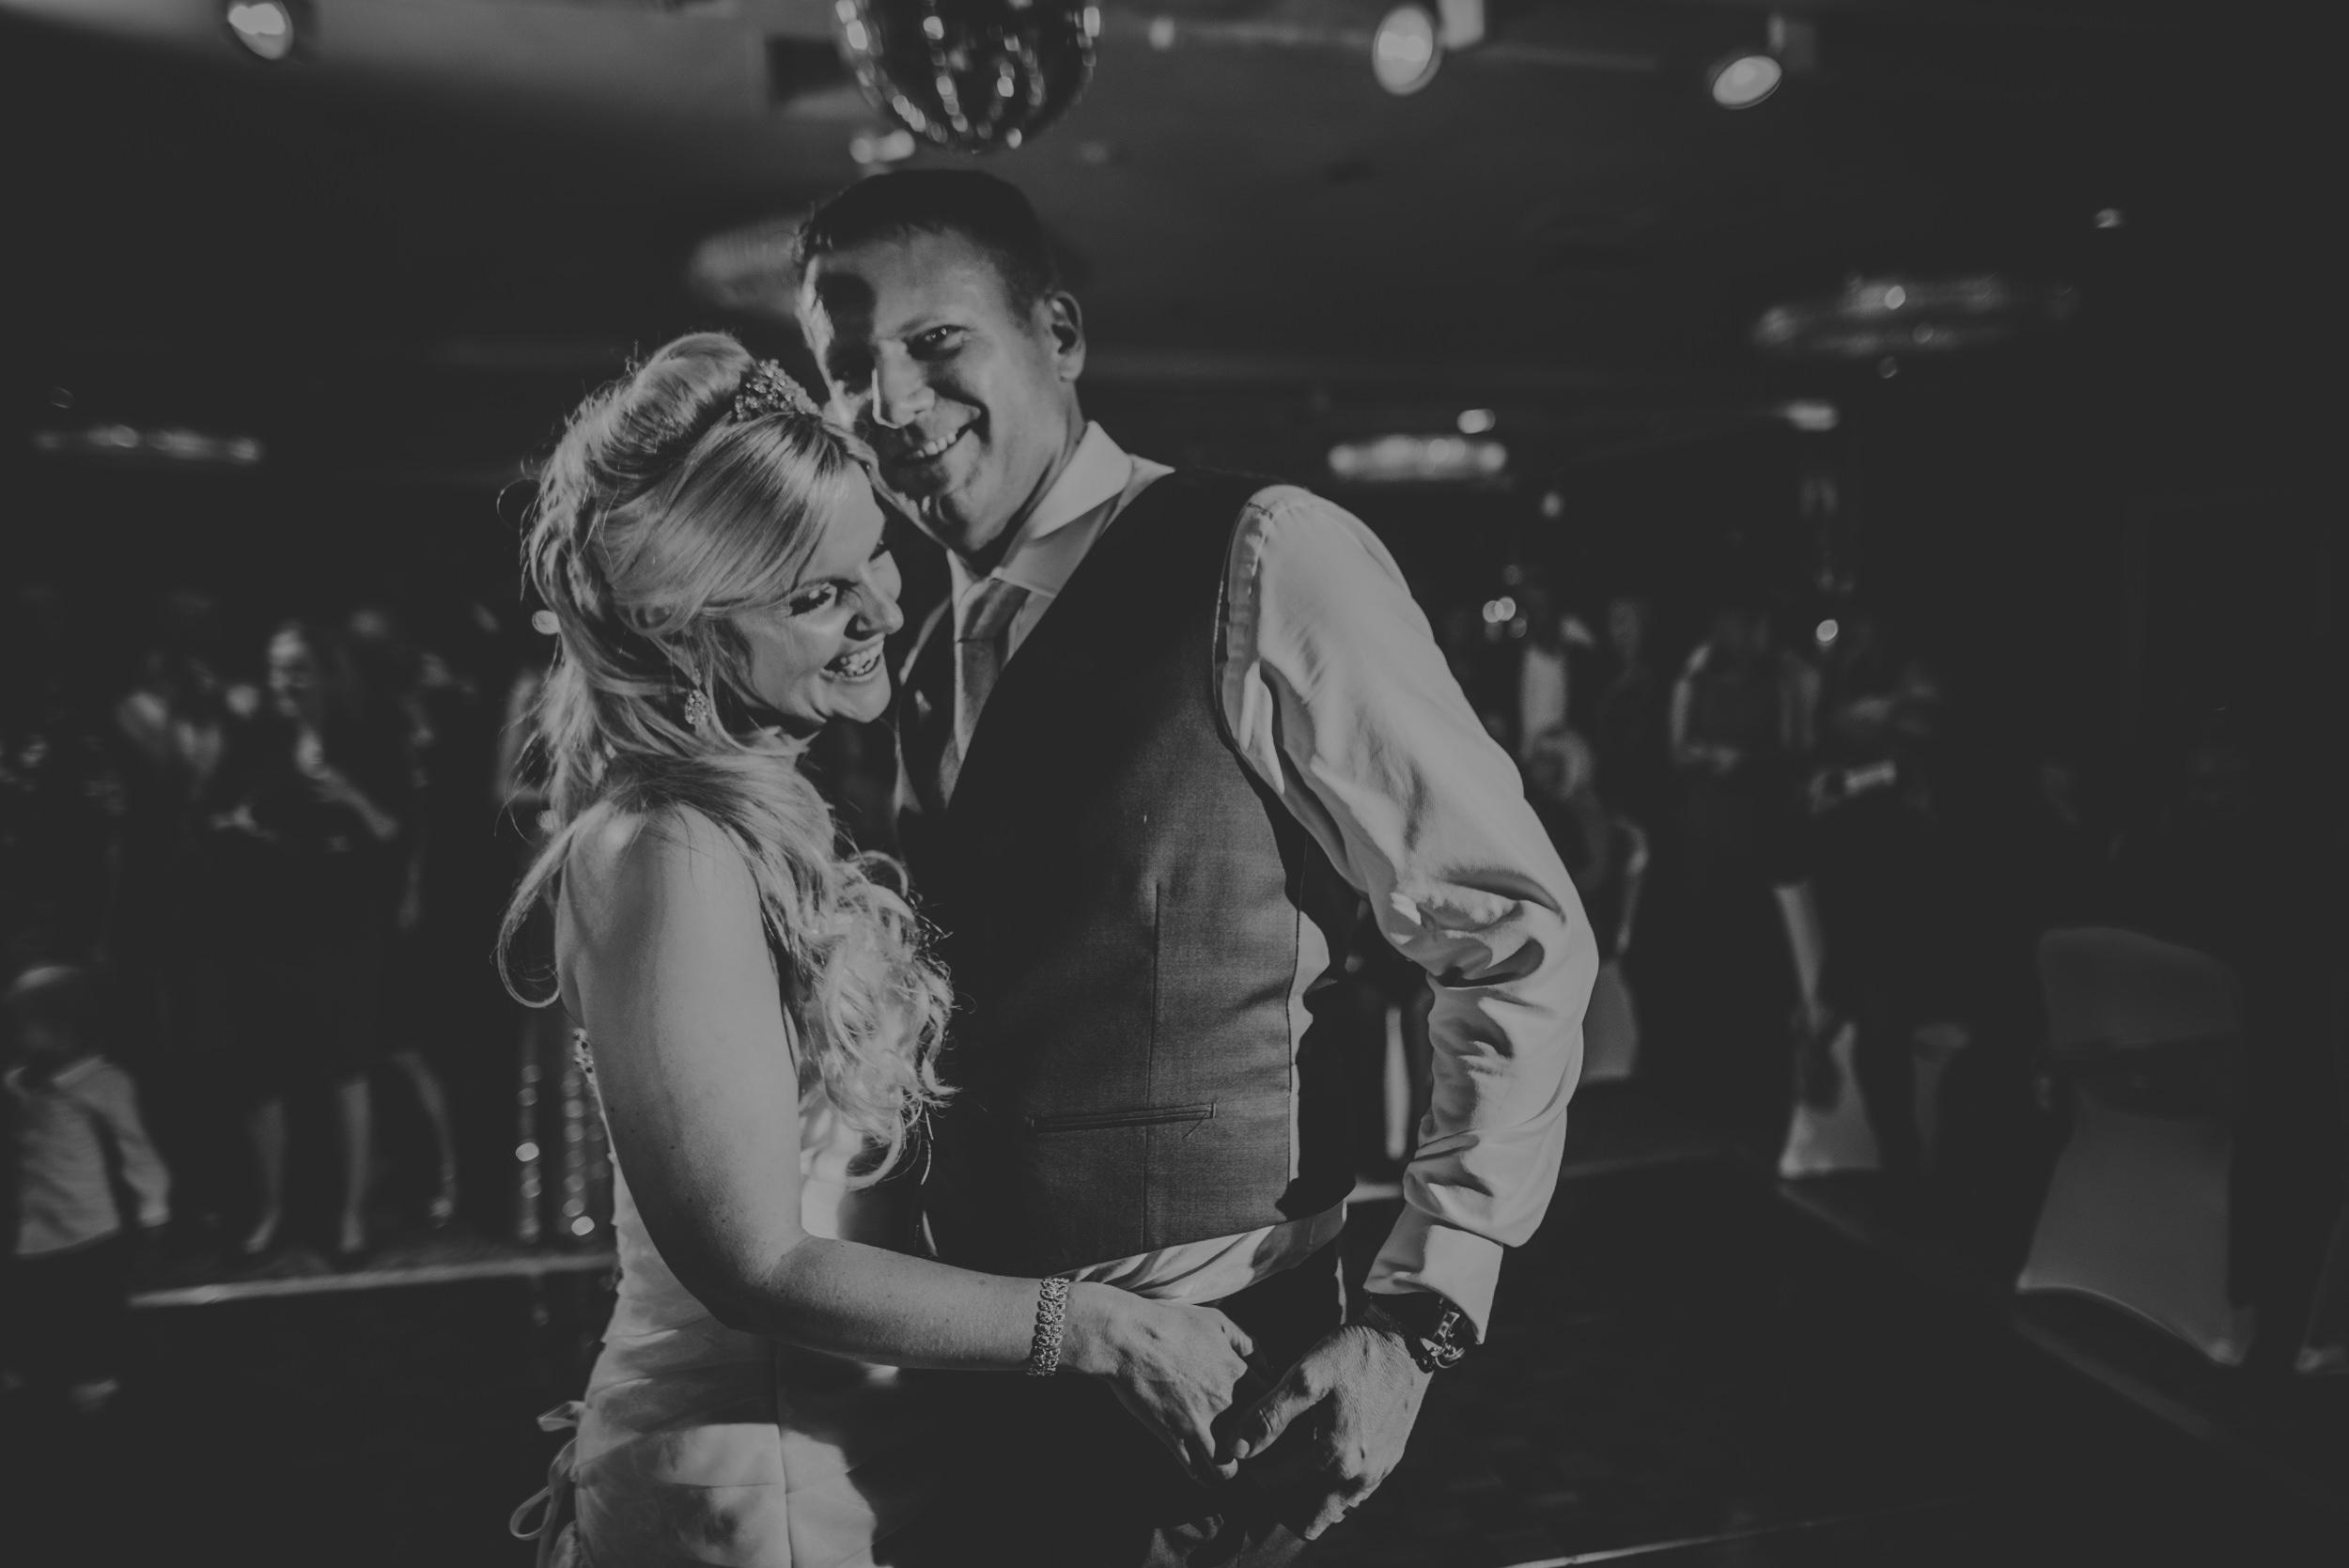 Trisha-and-Roger-wedding-The-Priory-Church-and-Chewton-Glen-Hotel-Christchurch-Manu-Mendoza-Wedding-Photography-514.jpg